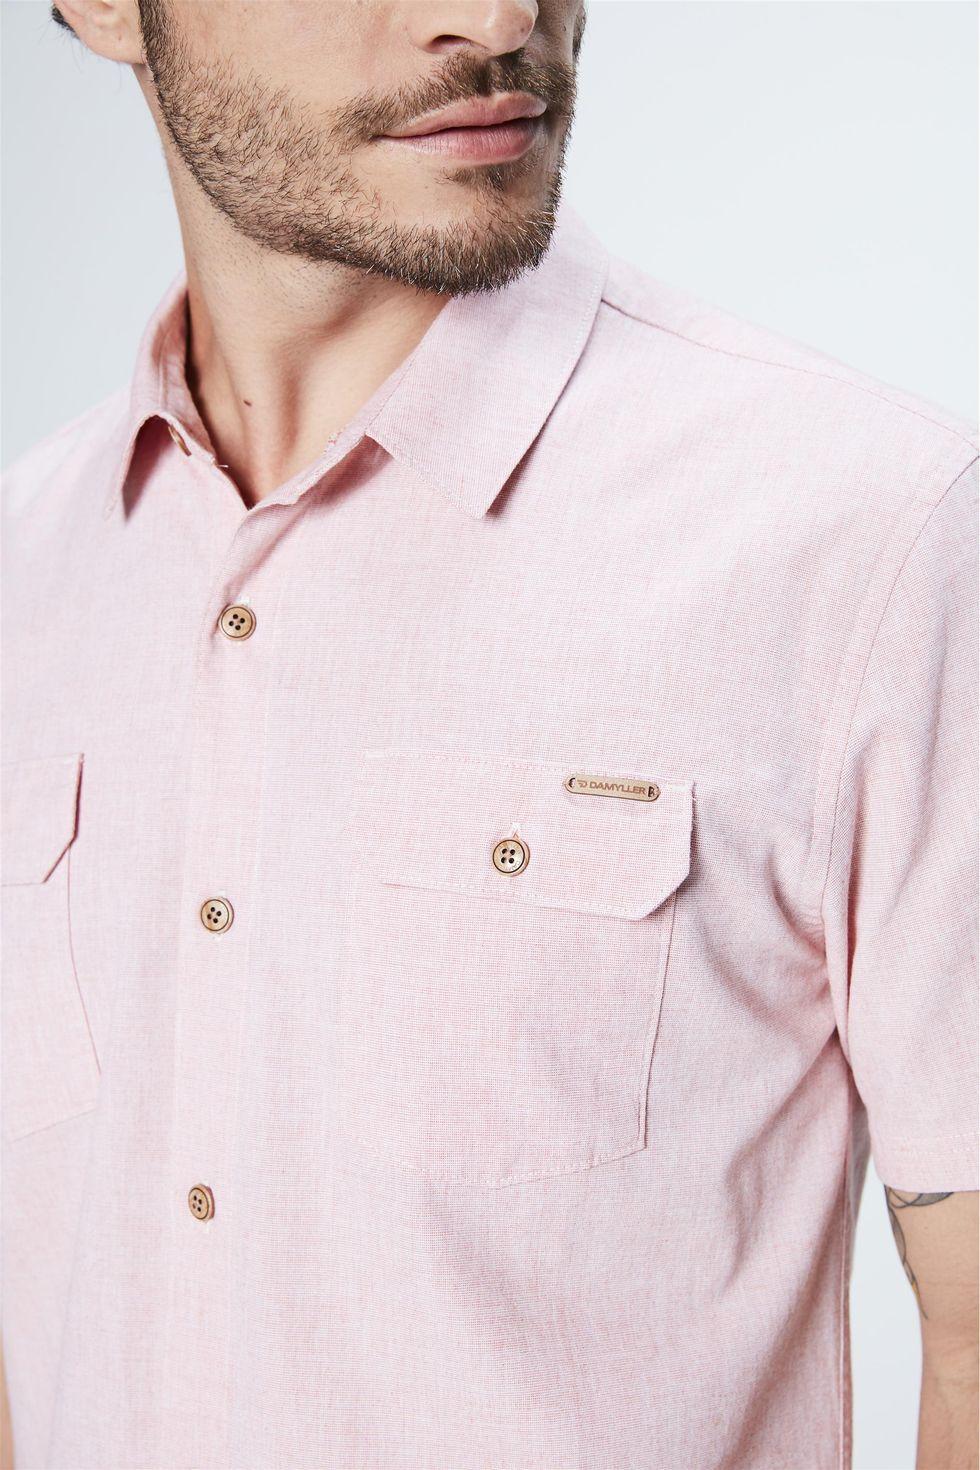 Camisa-de-Manga-Curta-Masculina-Frente--